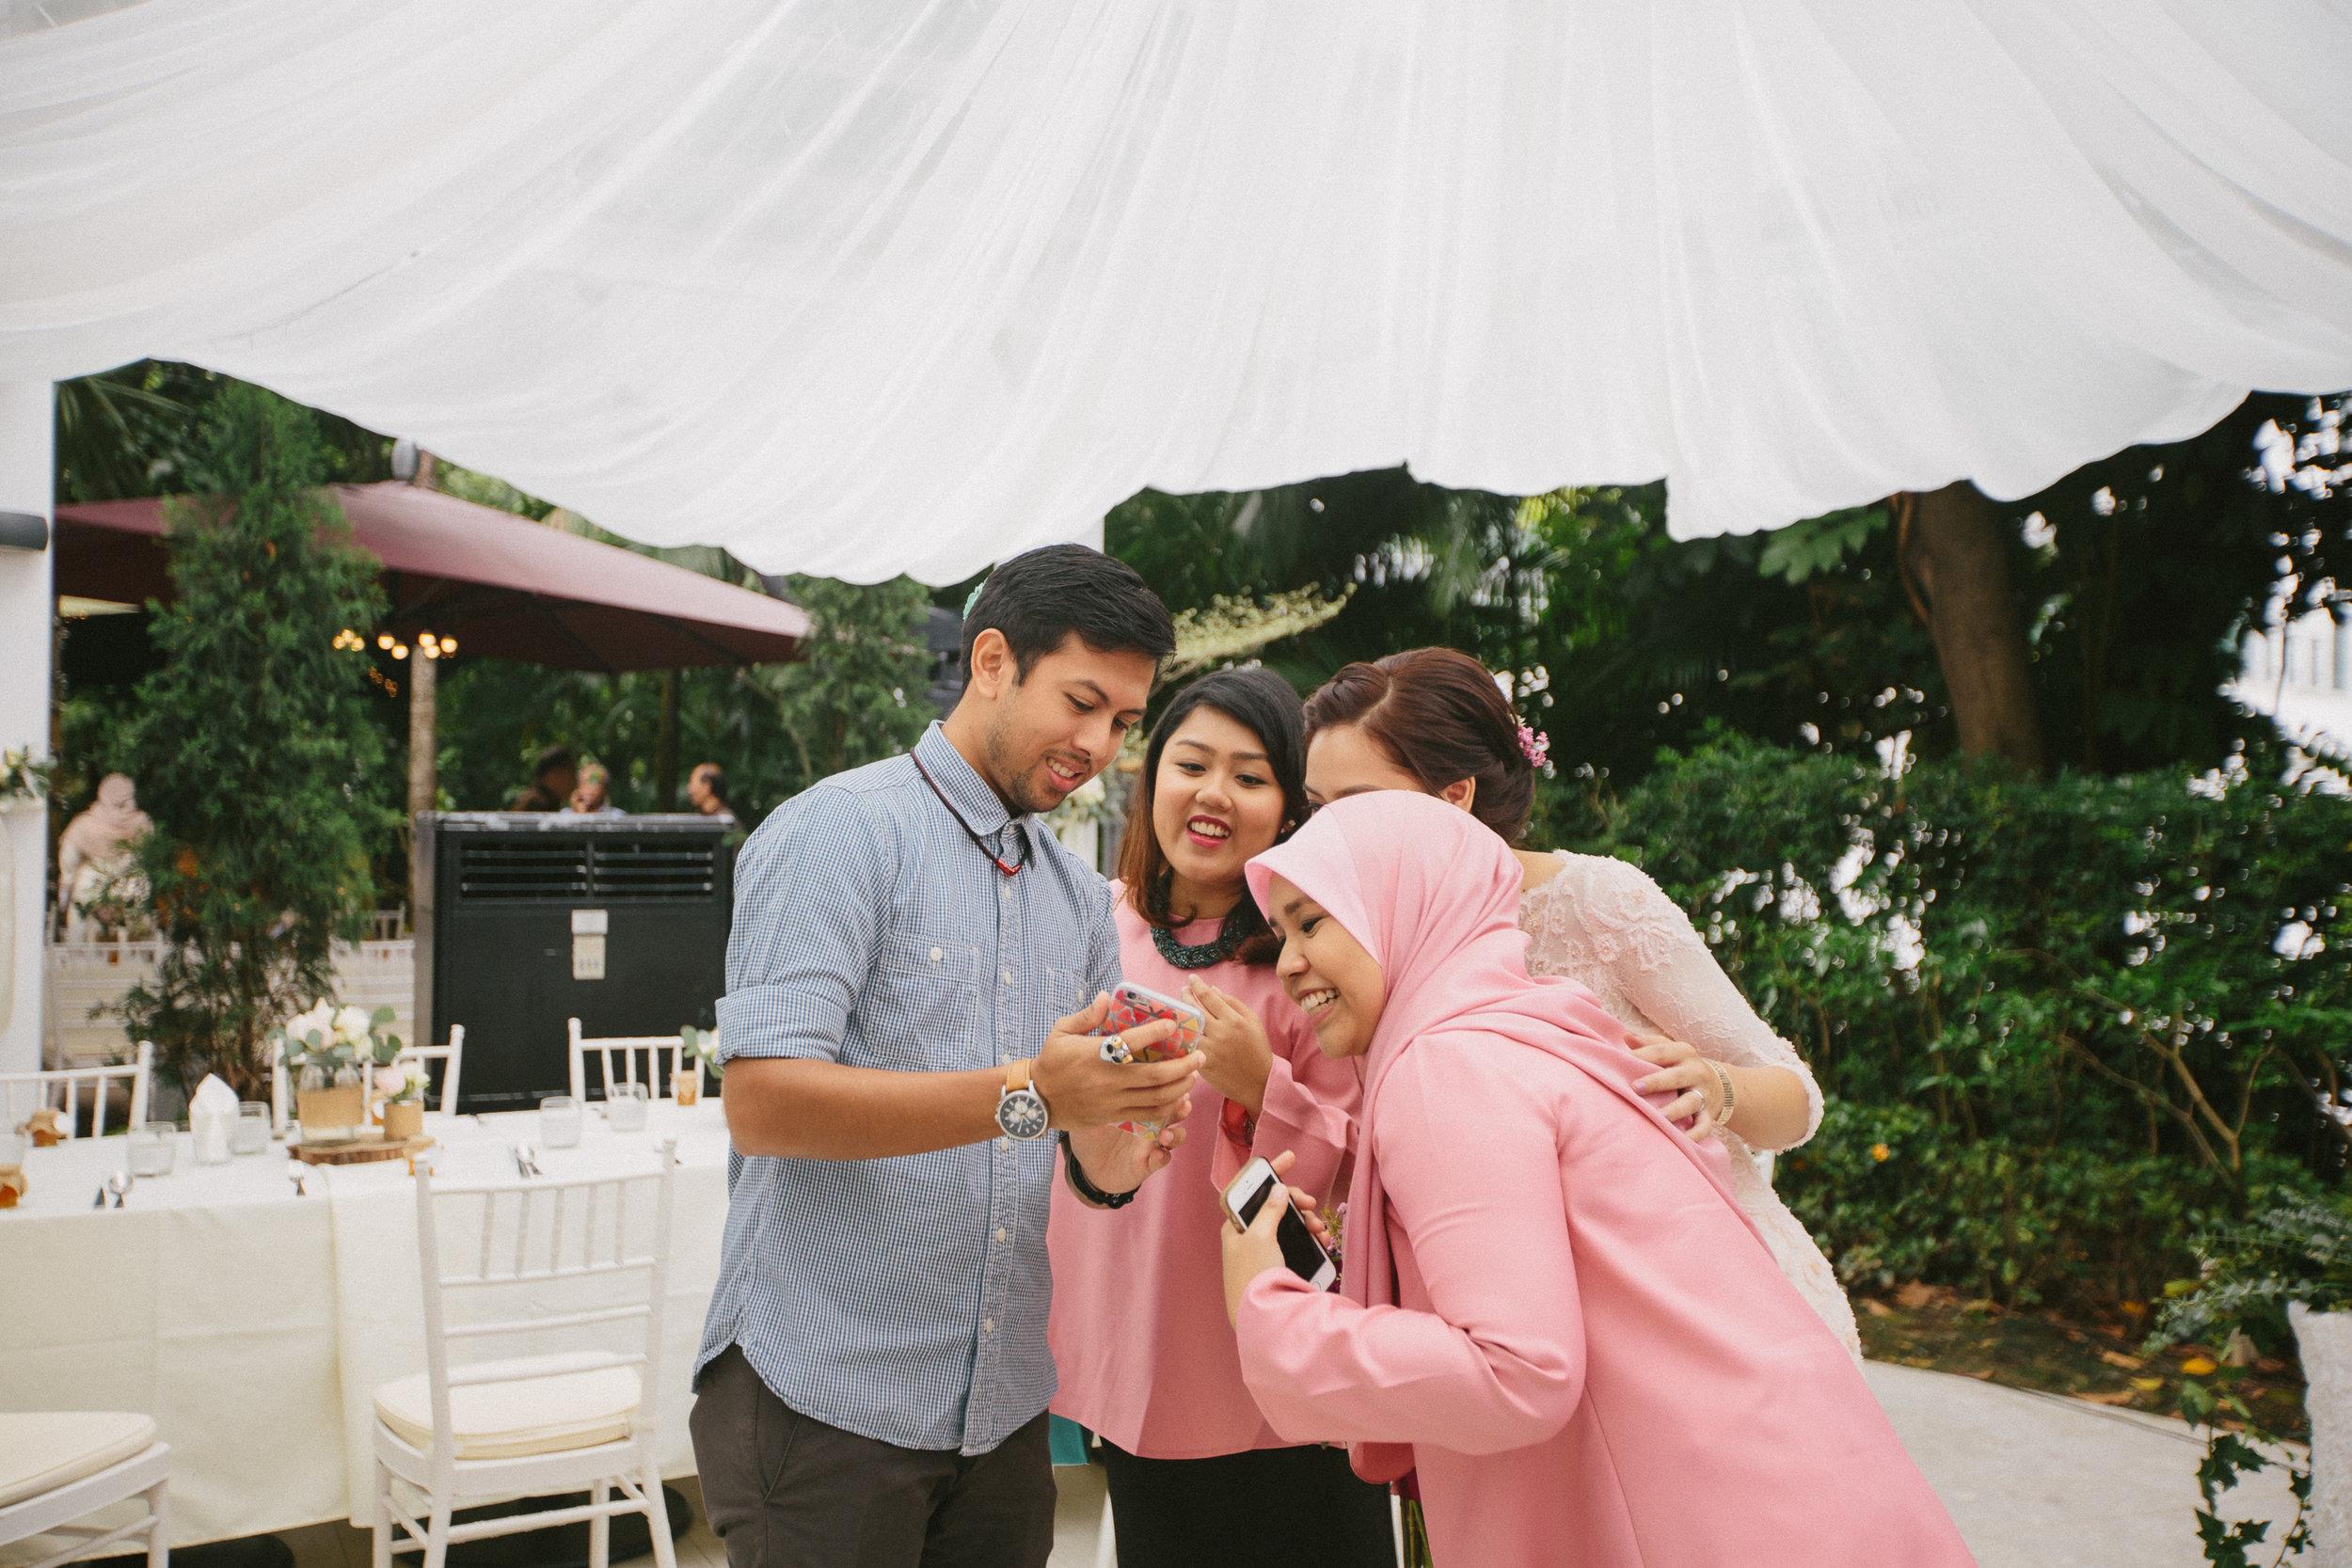 singapore-wedding-photographer-fadilah-kwan-015.jpg